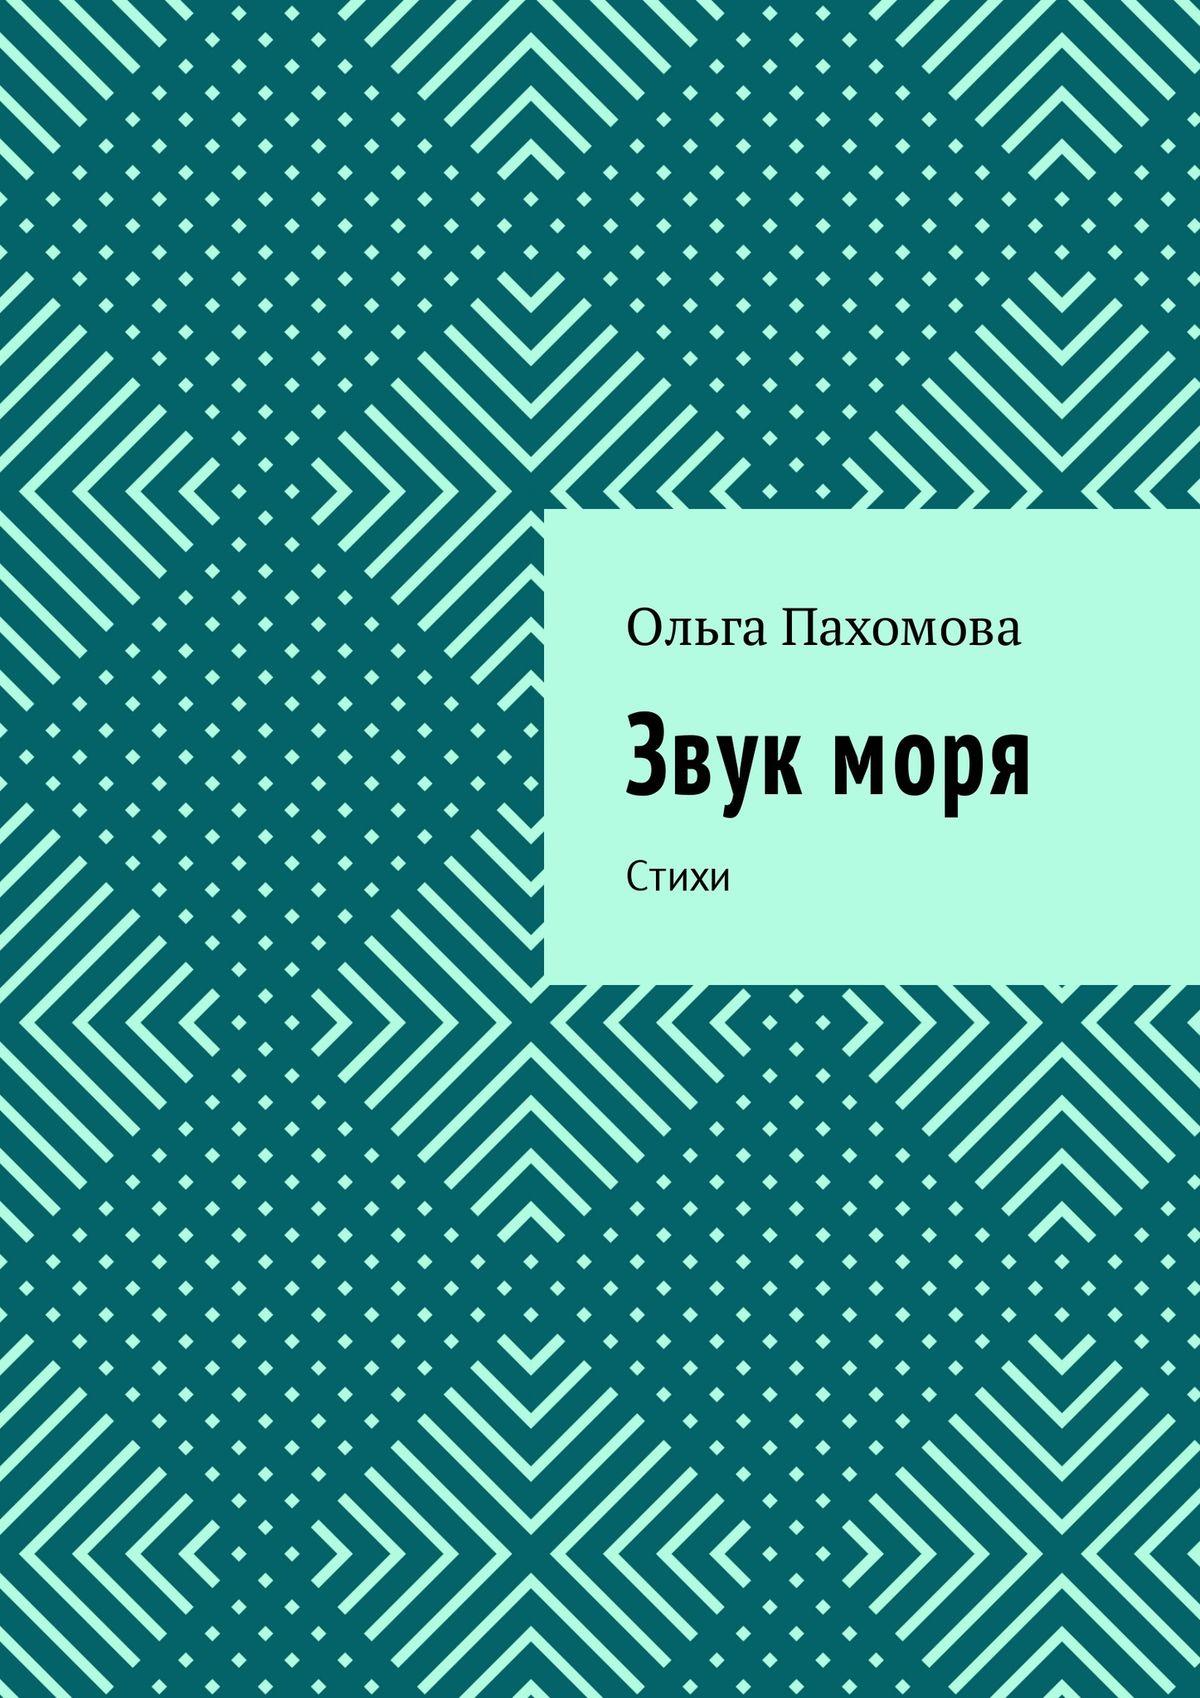 Ольга Пахомова Звук моря. Стихи